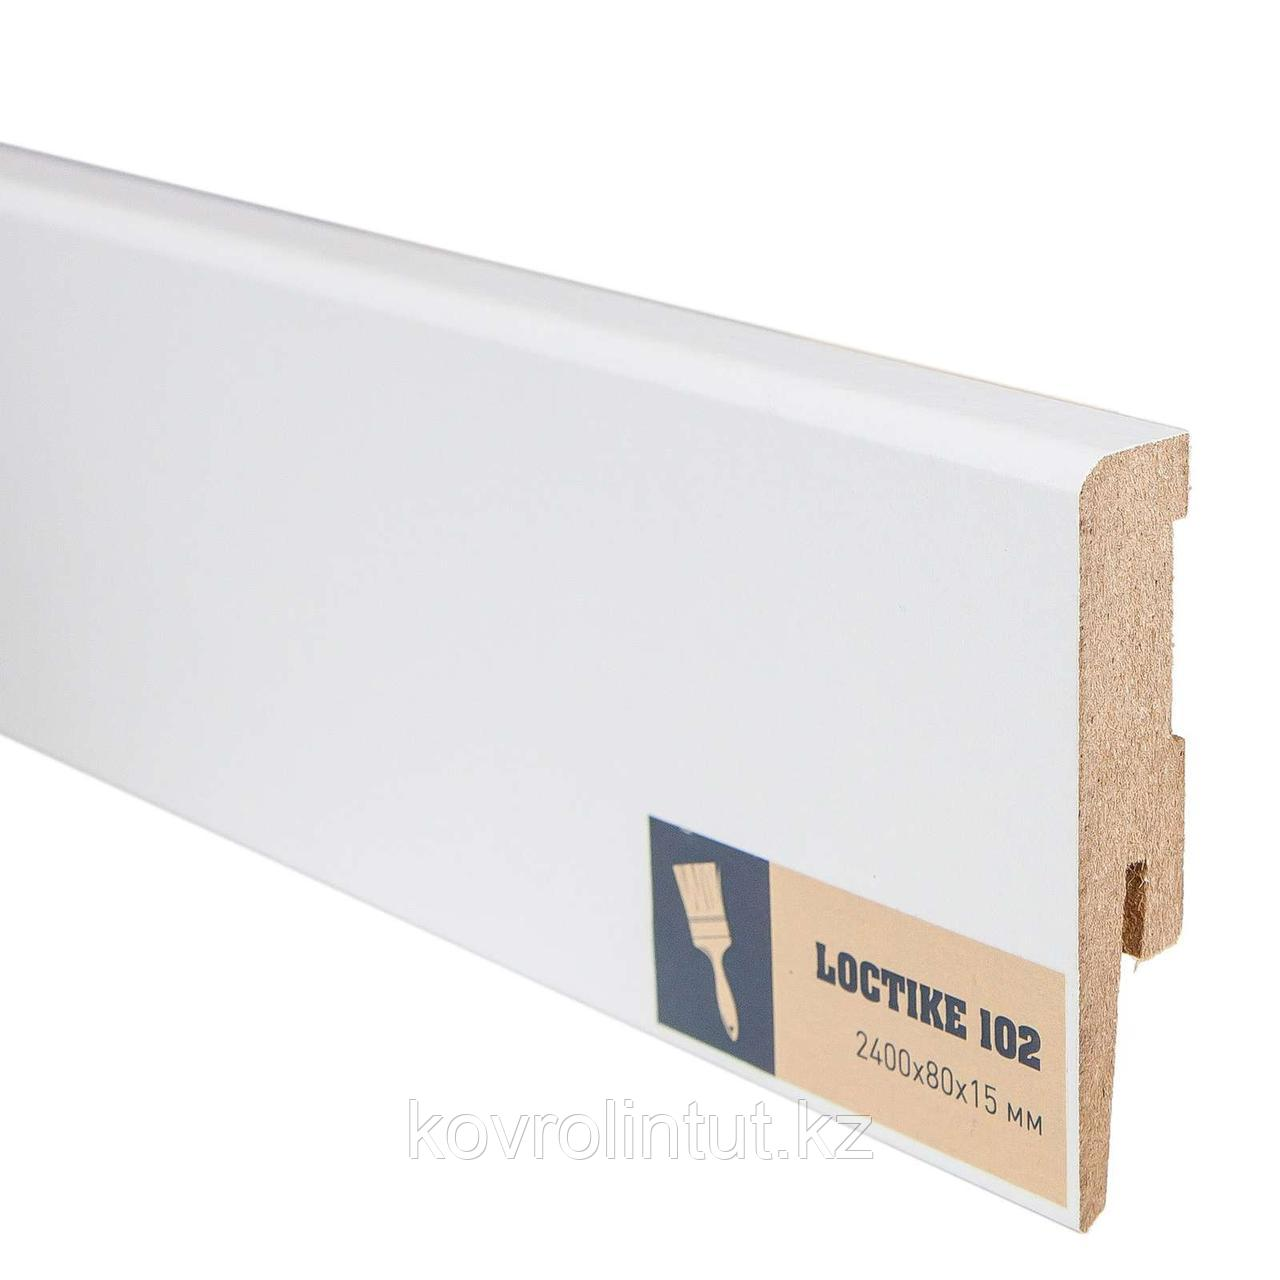 Плинтус Arbiton Loctike 102, МР0801, белый, 2420х80х15 мм.